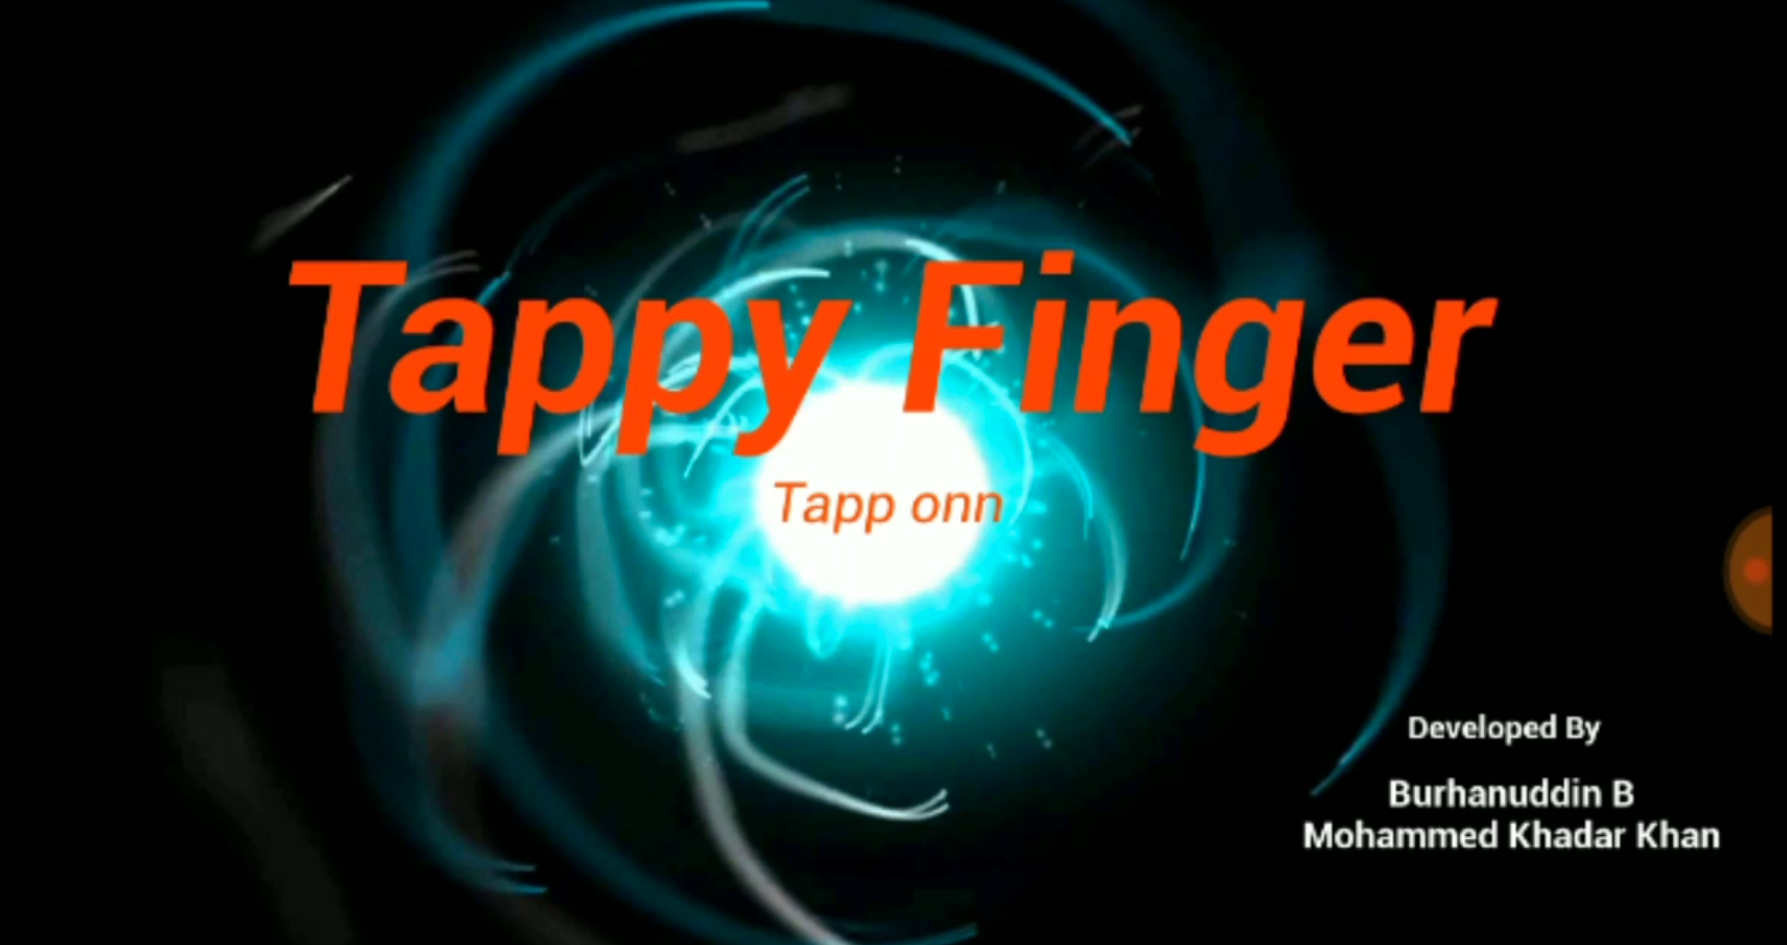 TappyFinger